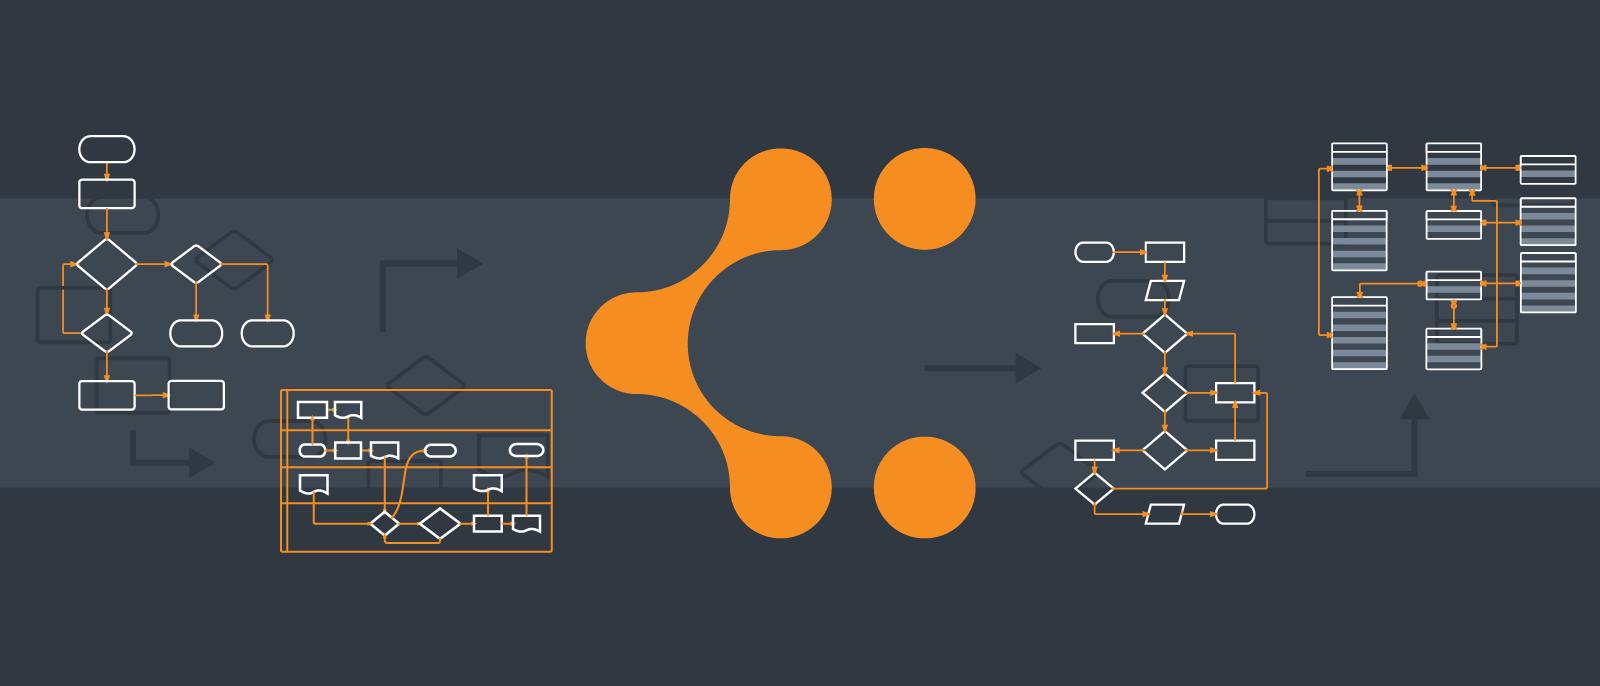 diagrams for sales